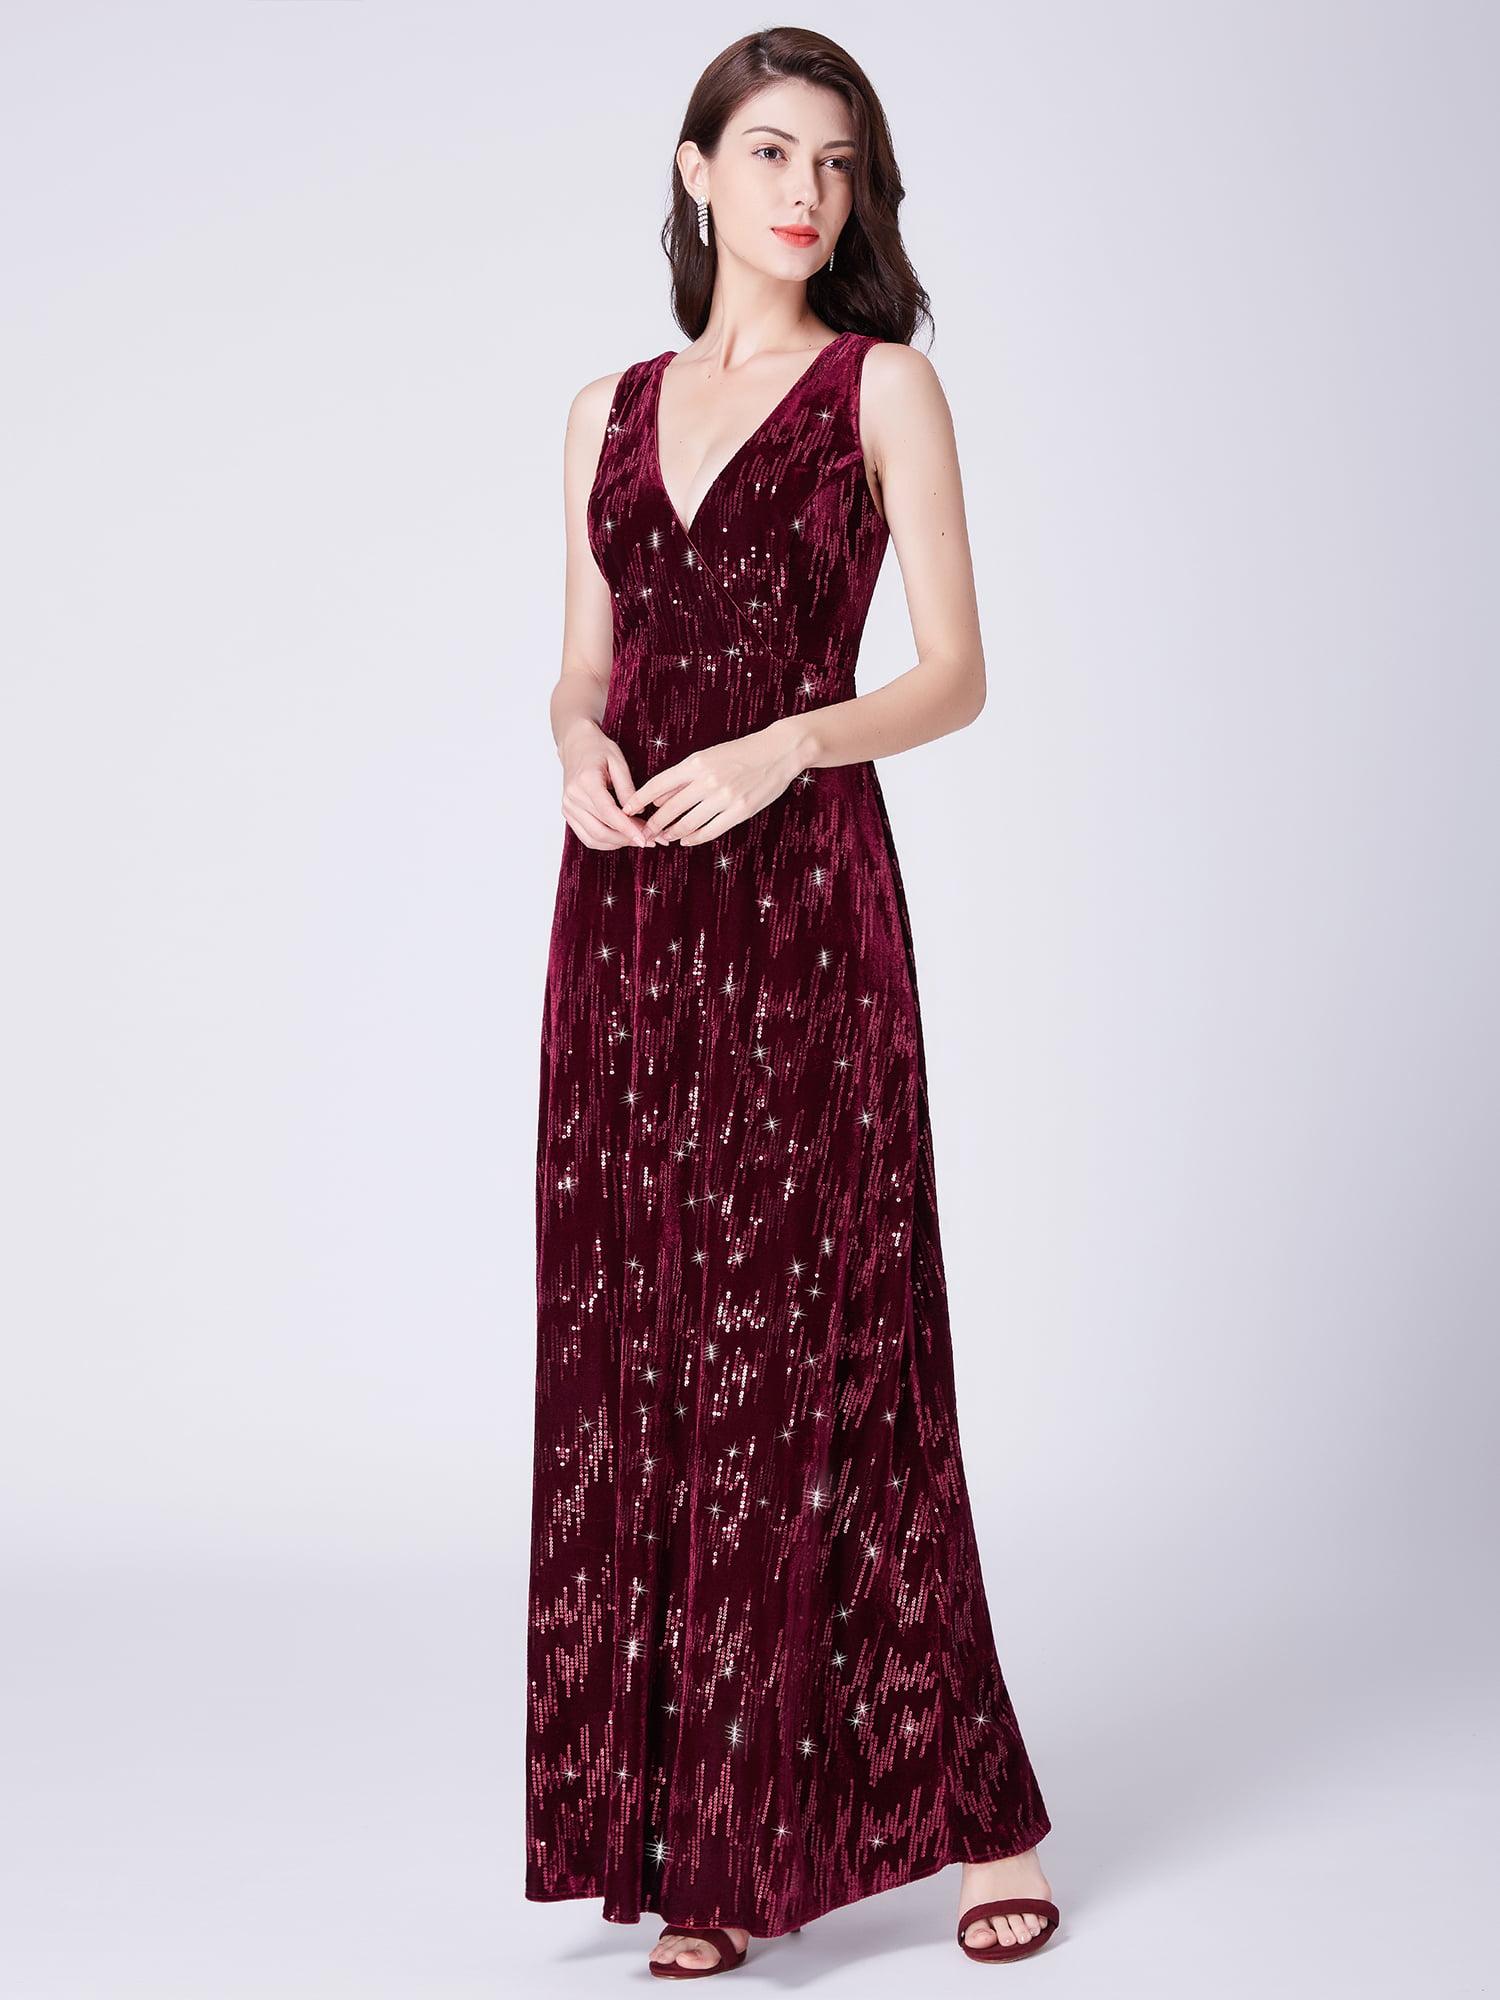 a352a54a1201 Ever-pretty - Ever-Pretty Women's Classical Velvet Christmas Party Long  Formal Evening Ball Gowns for Women 07506 US 12 - Walmart.com